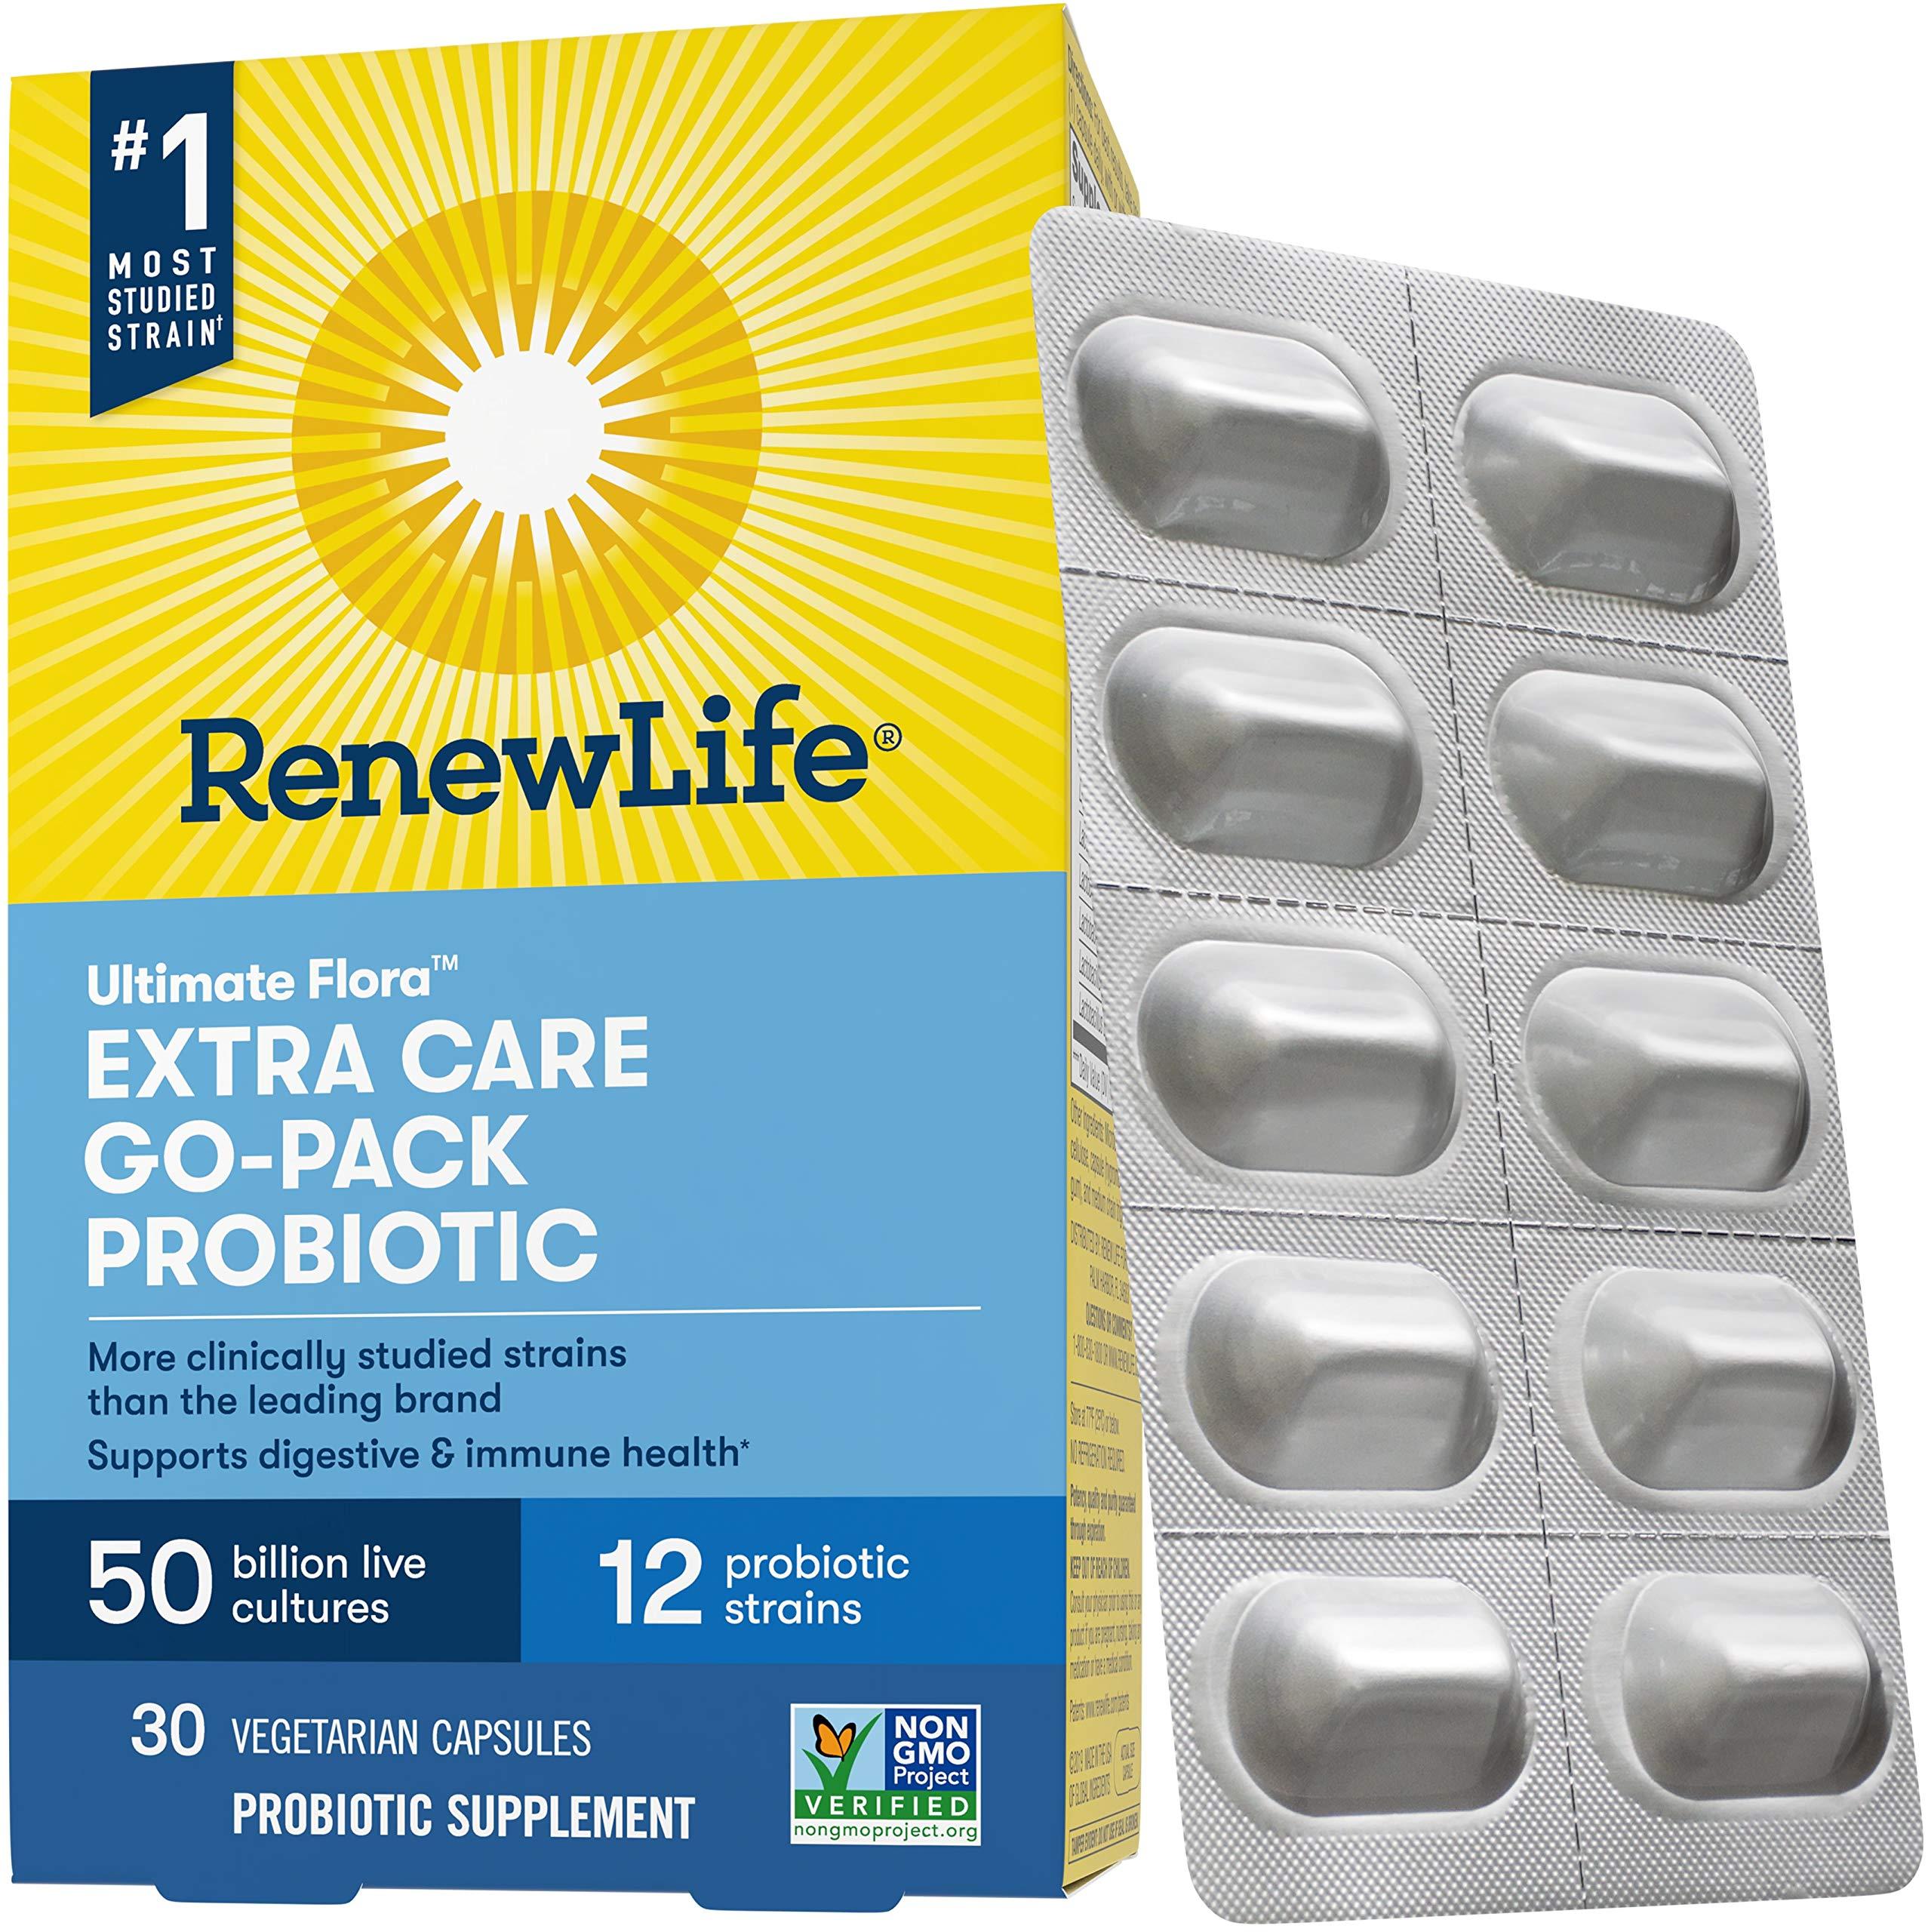 Renew Life Adult Probiotic - Ultimate Flora Extra Care Go-Pack Probiotic Supplement - Gluten, Dairy & Soy Free - 50 Billion CFU - 30 Vegetarian Capsules